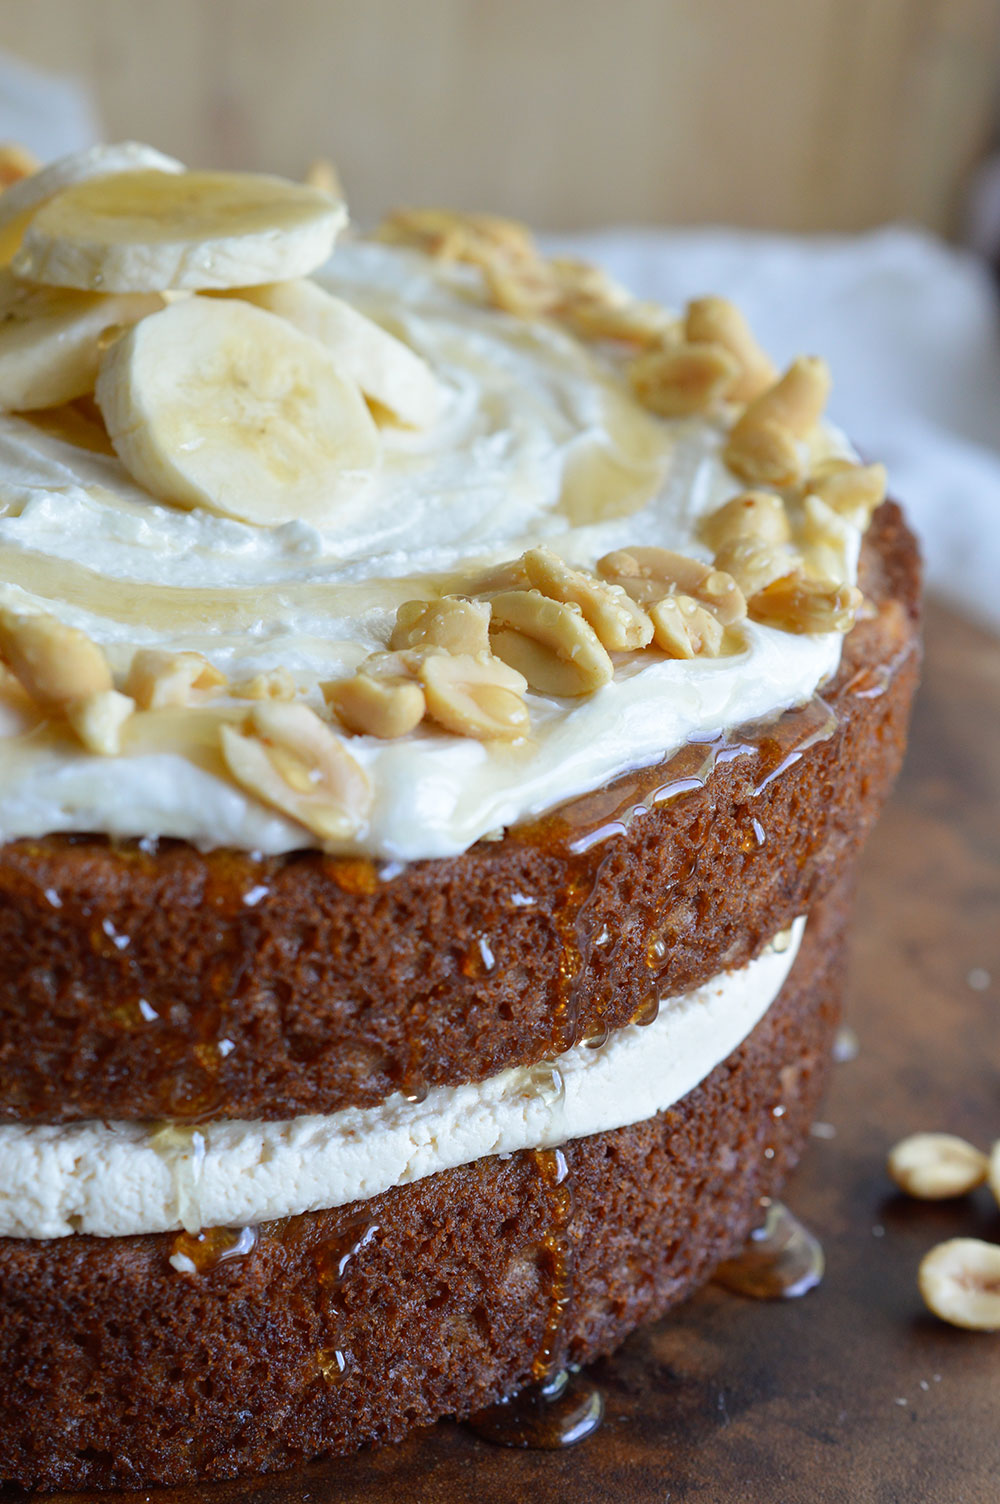 Peanut Butter Honey and Banana Layer Cake